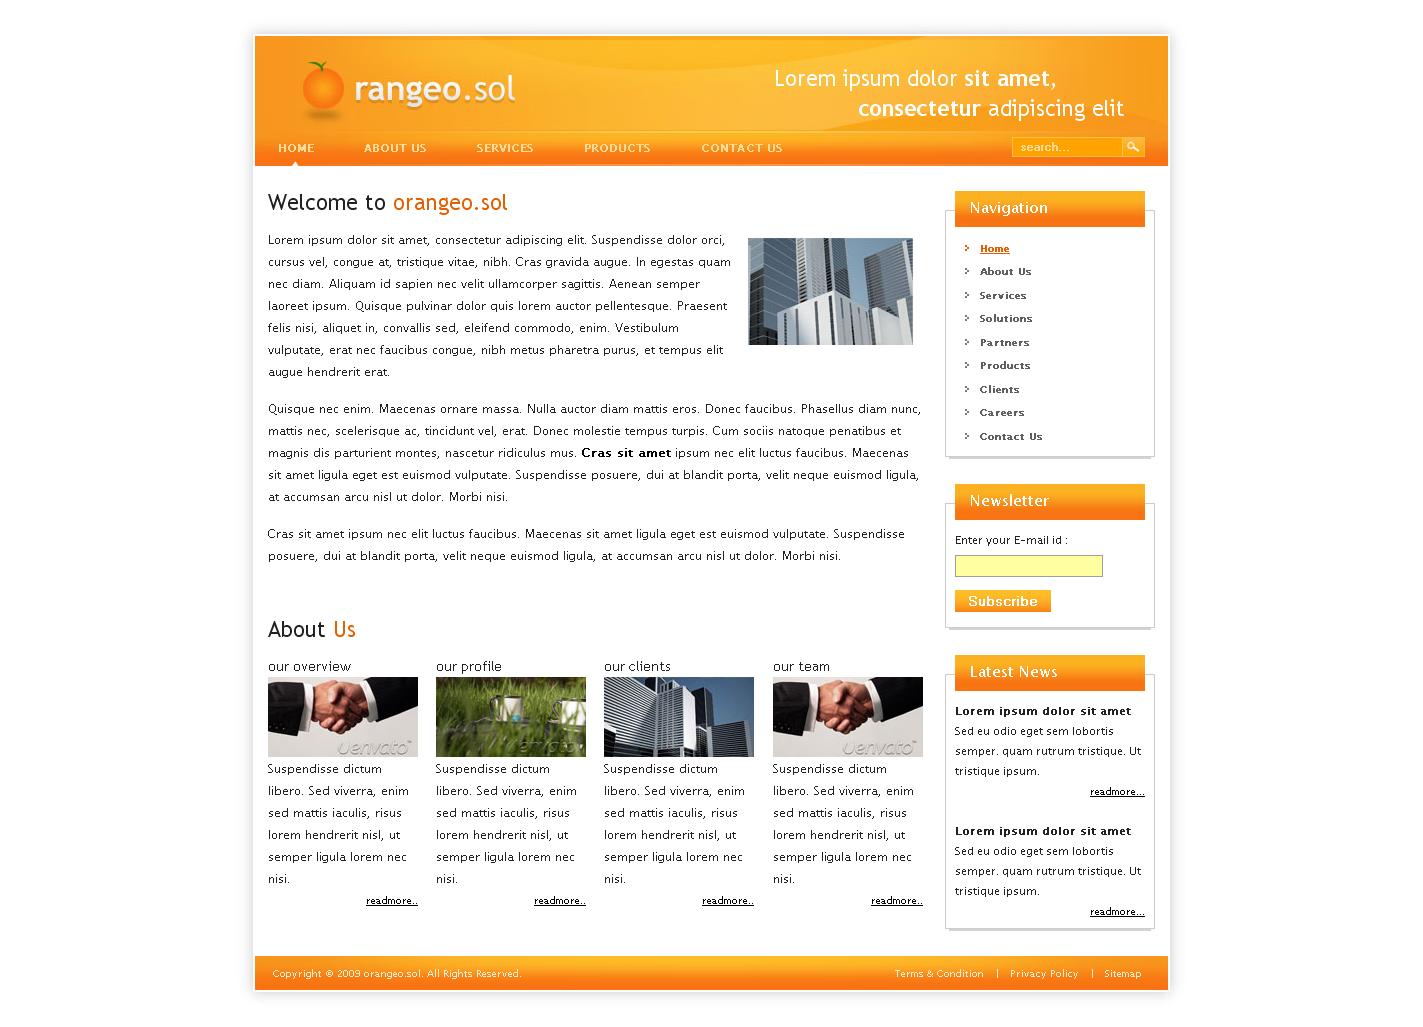 Orangeo.sol - Home Page of Orangeo